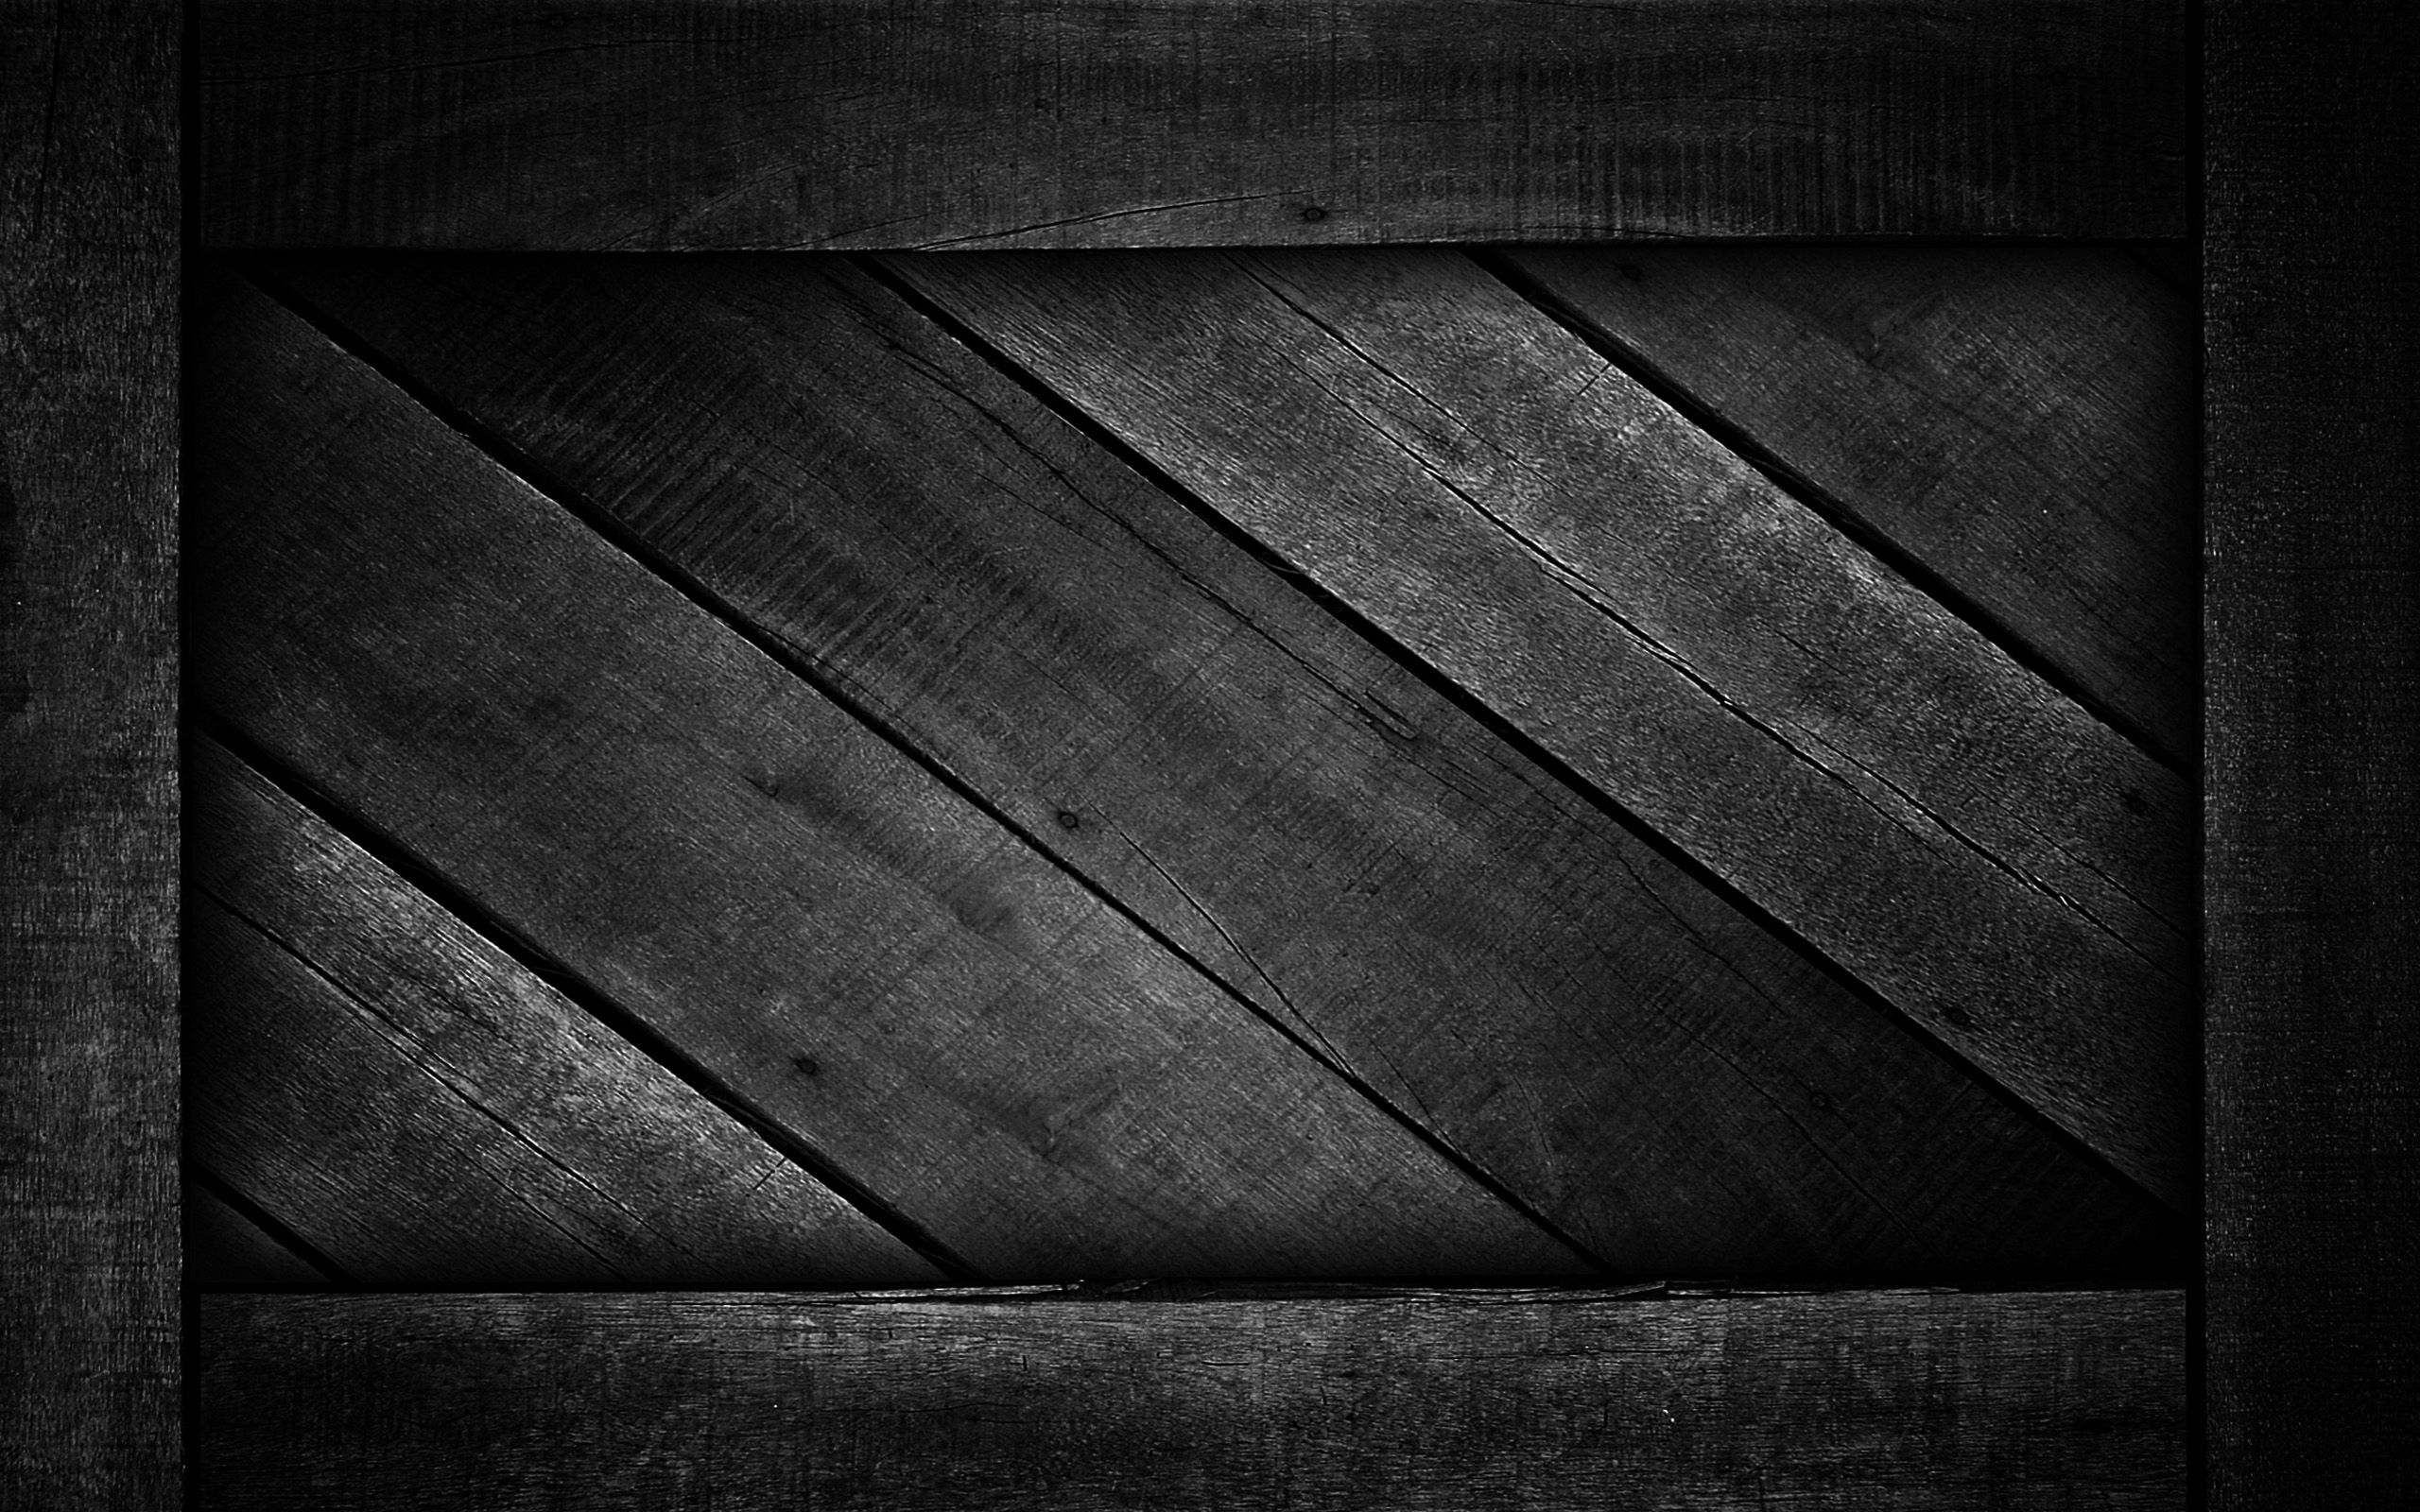 Background image black - 06 08 15 2560x1600px Black Background Images Desktop Wallpapers Free 3d Wallpapers Feelgrafix Com Pinterest Black Backgrounds Background Images